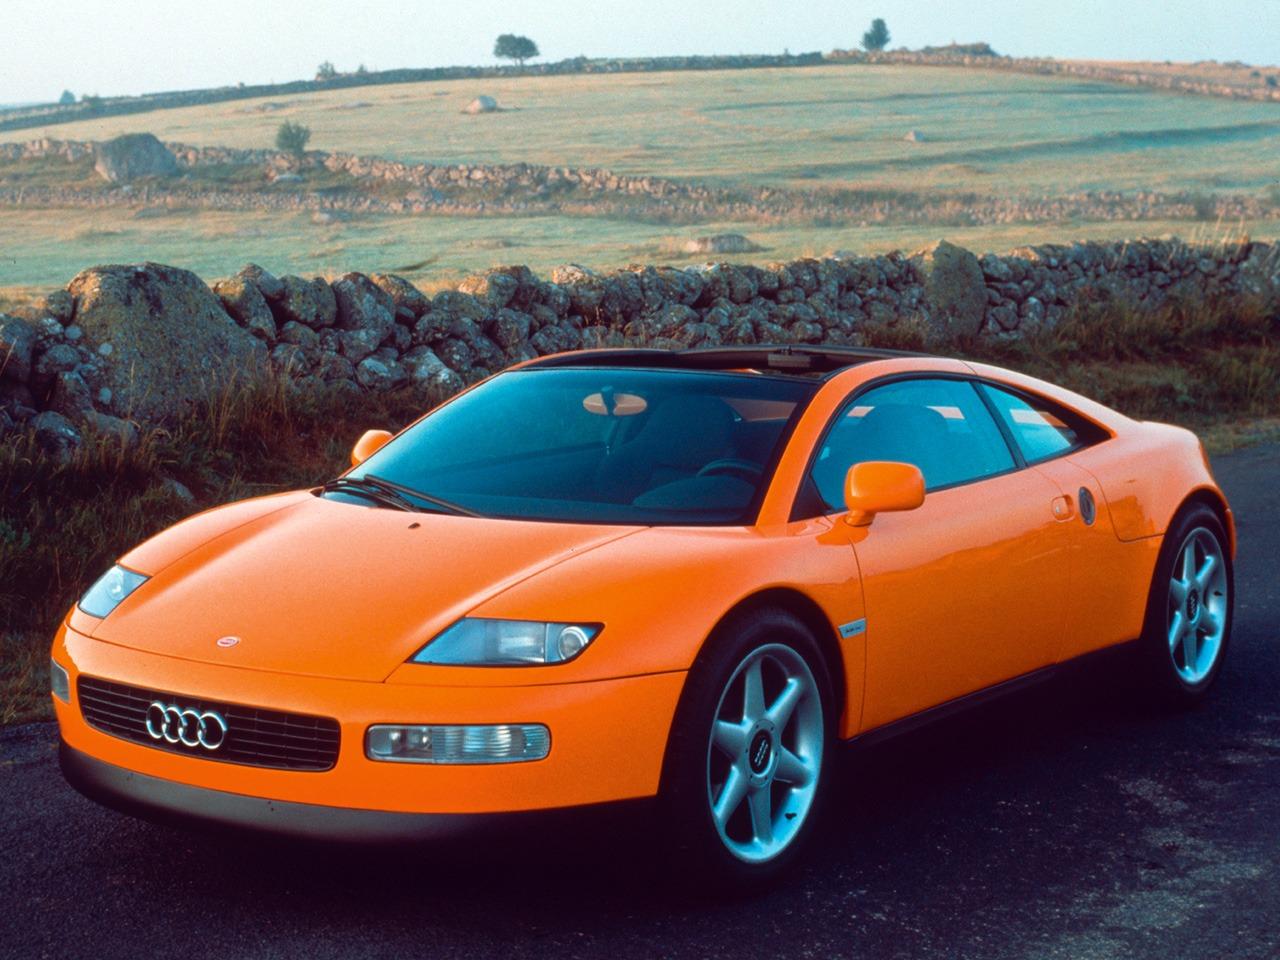 Audi Quattro Spyder Concept (1991) - Old Concept Cars